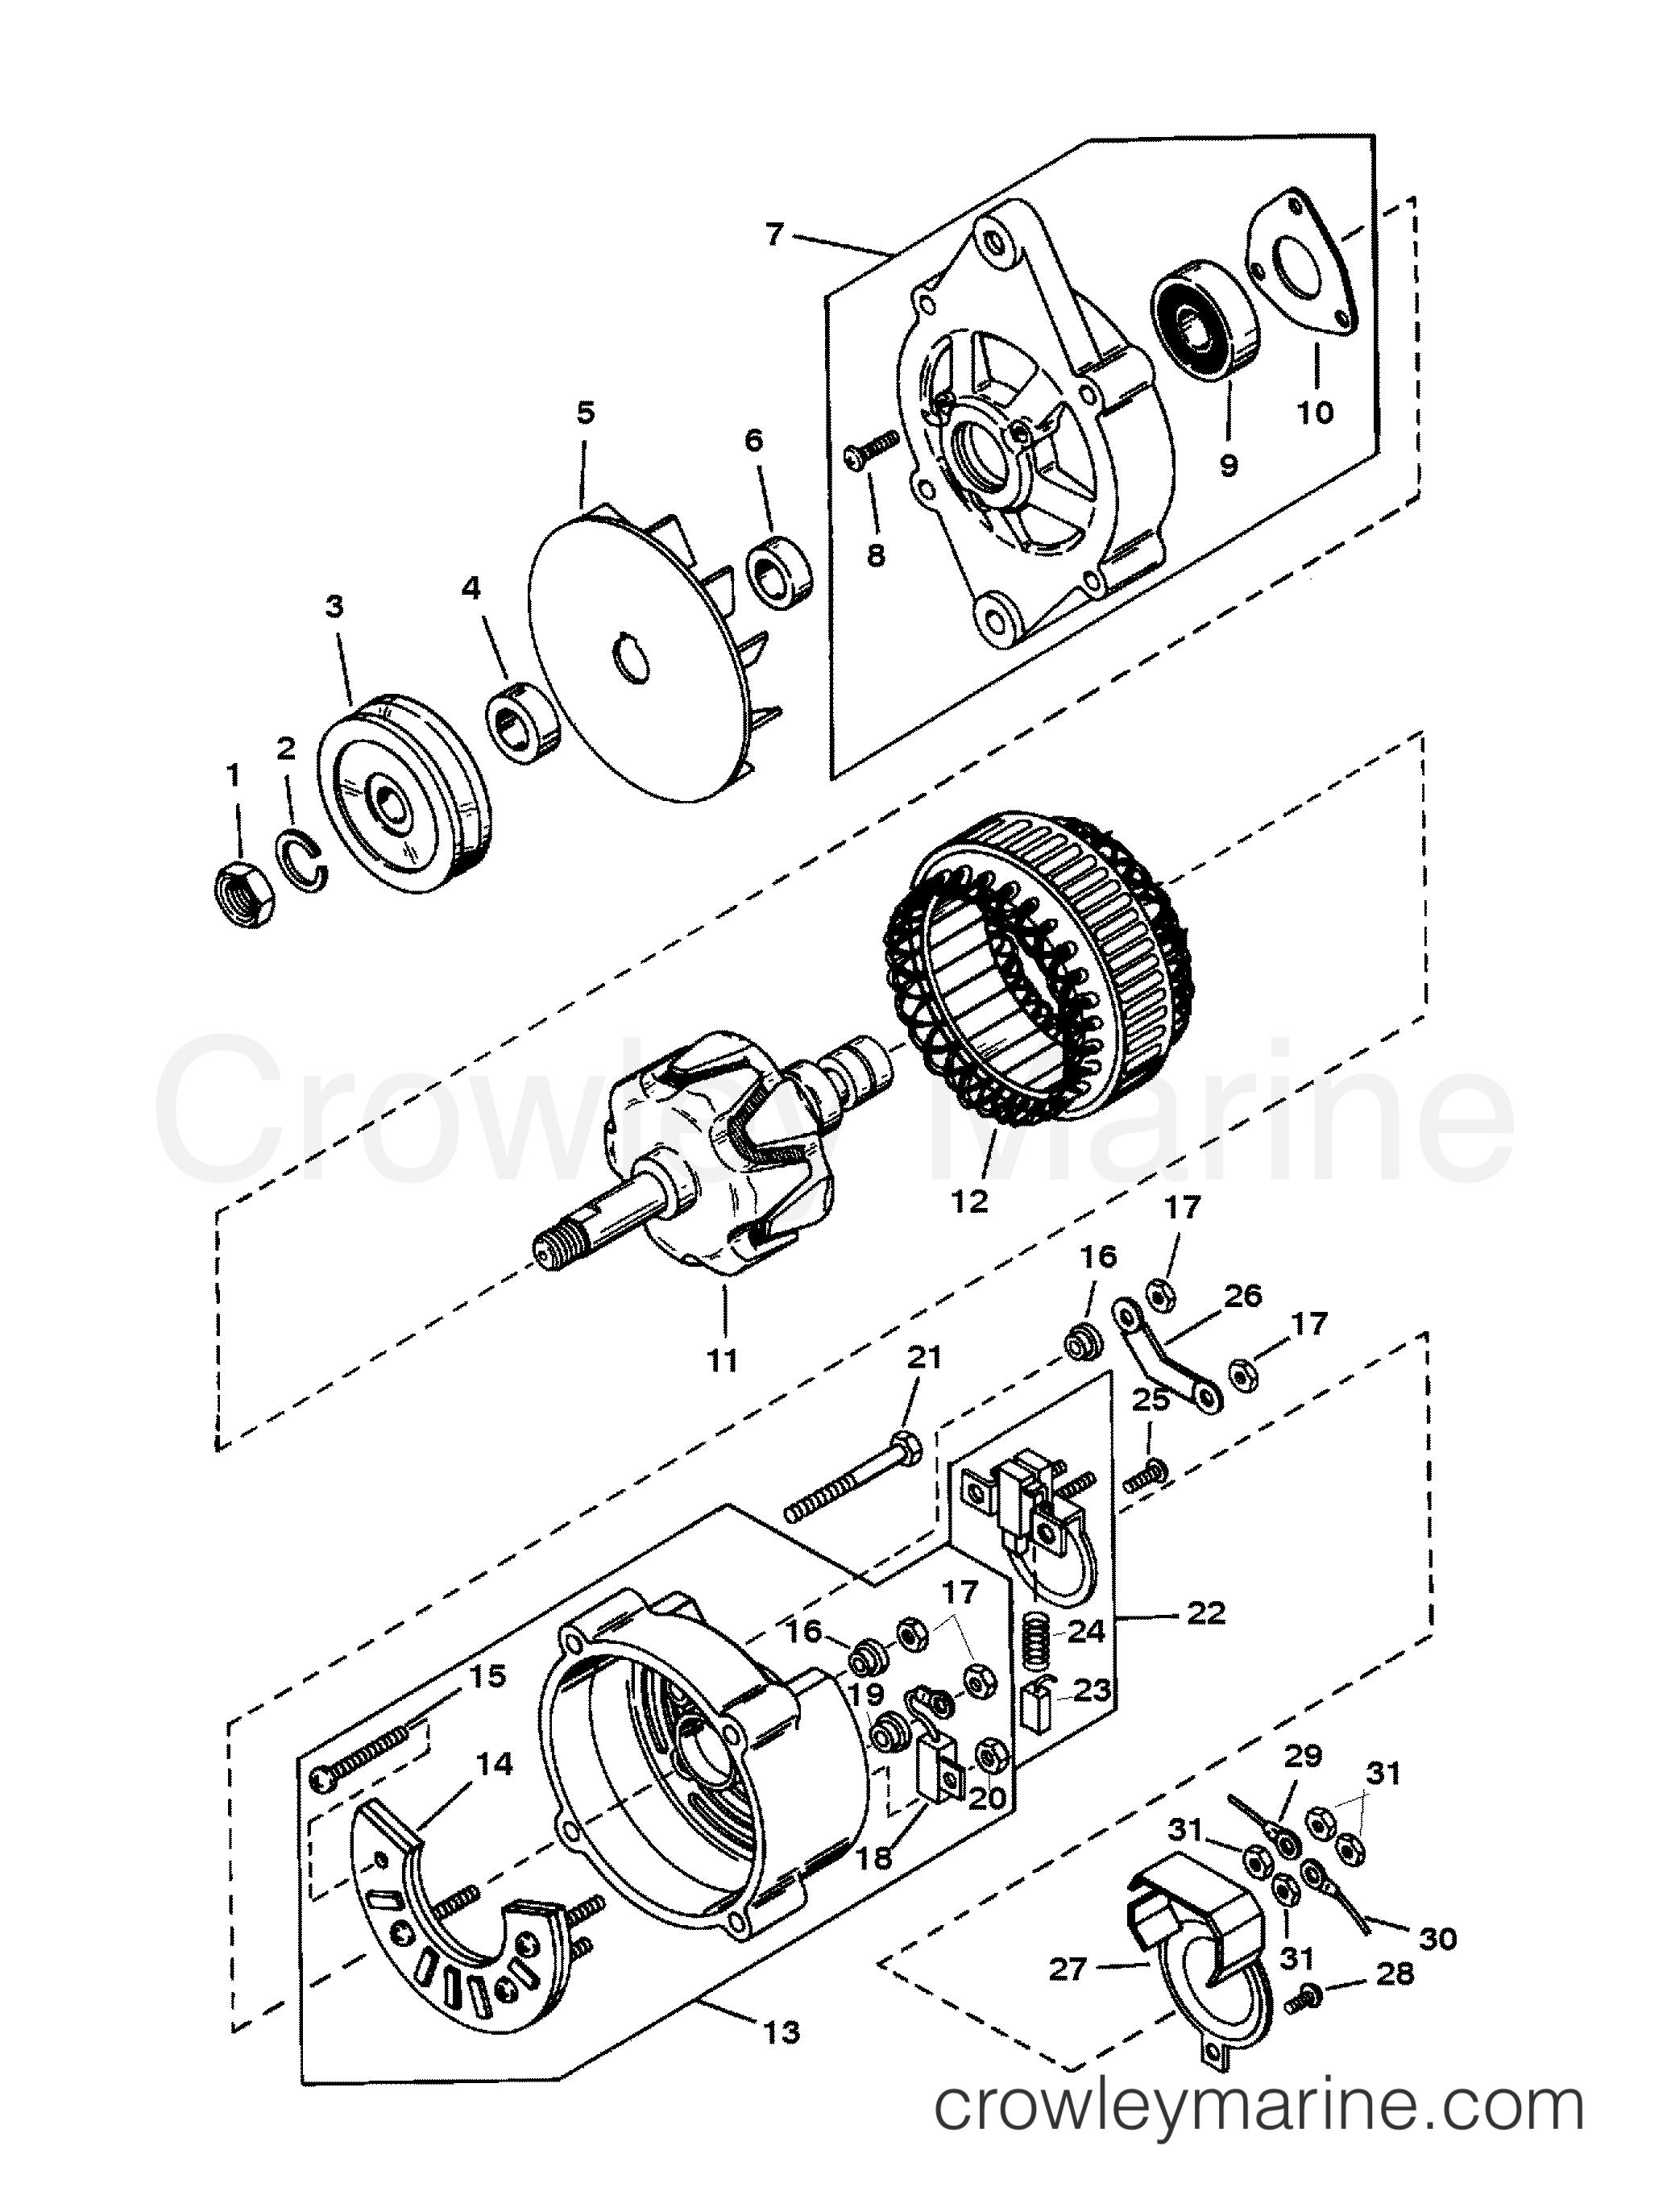 ALTERNATOR (MANDO #AC155603) - 1991 Mercury Inboard Engine 5.7L ...